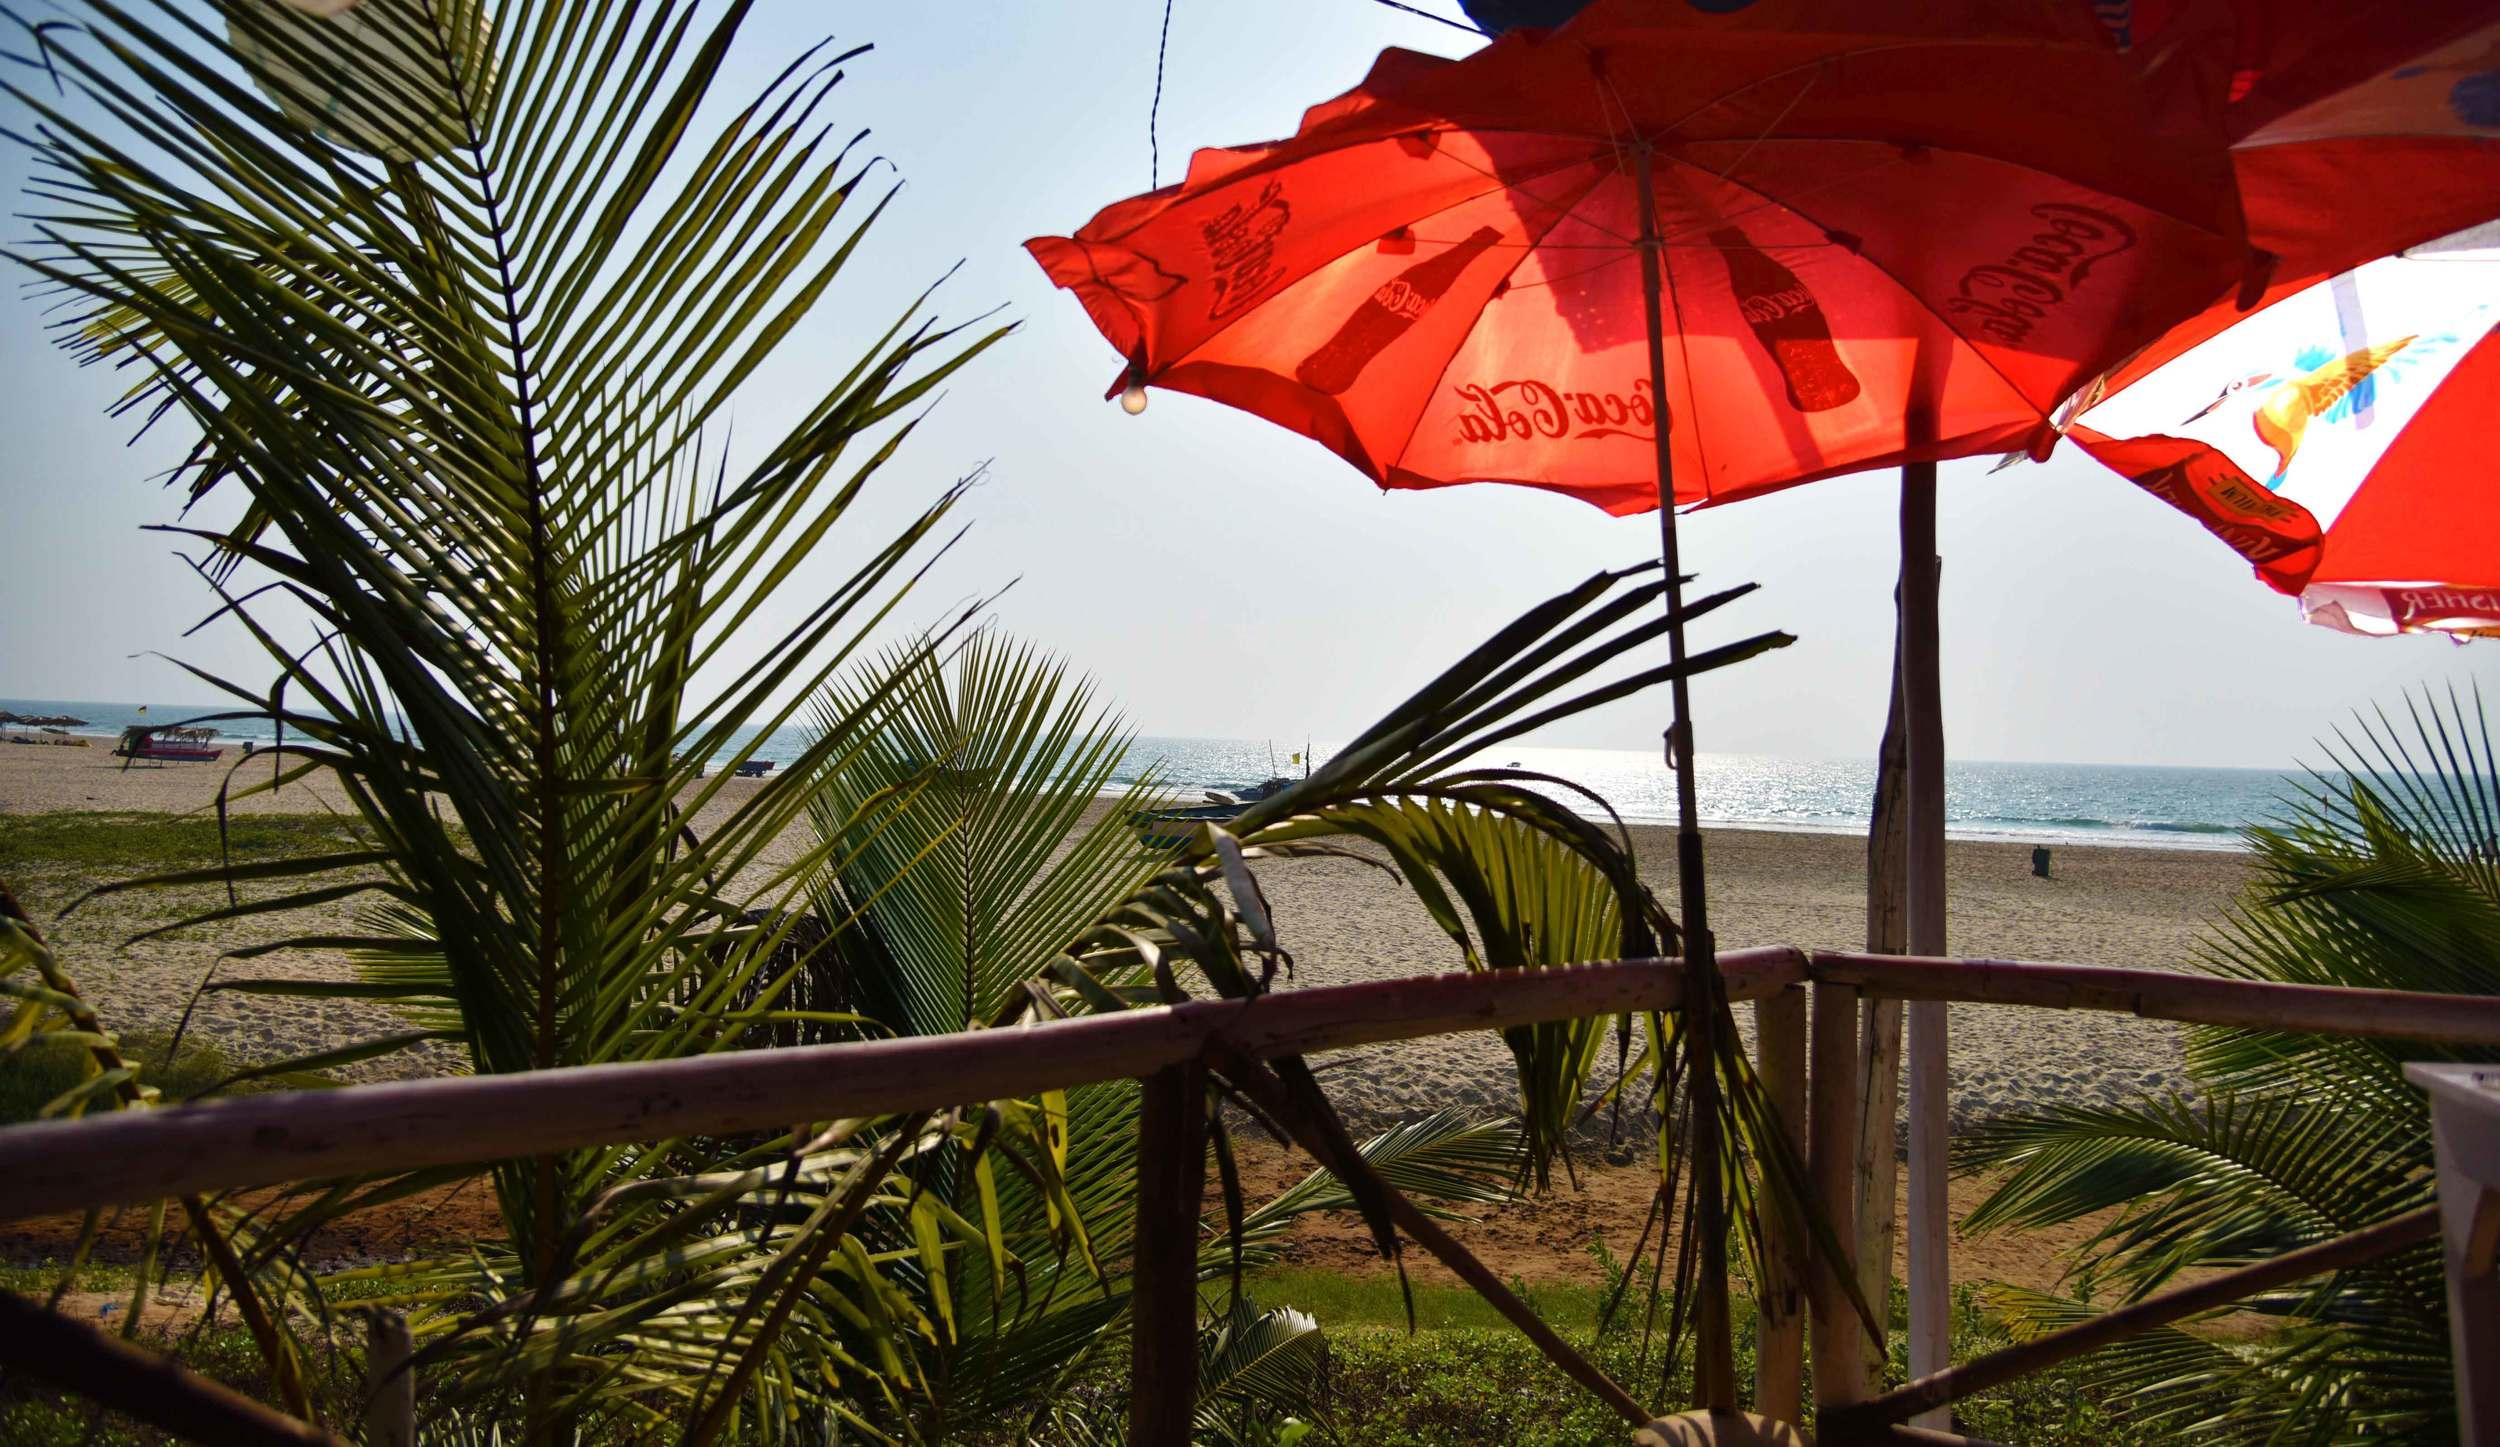 Zeebop, Goan restaurant,Goa, India. Image©thingstodot.com